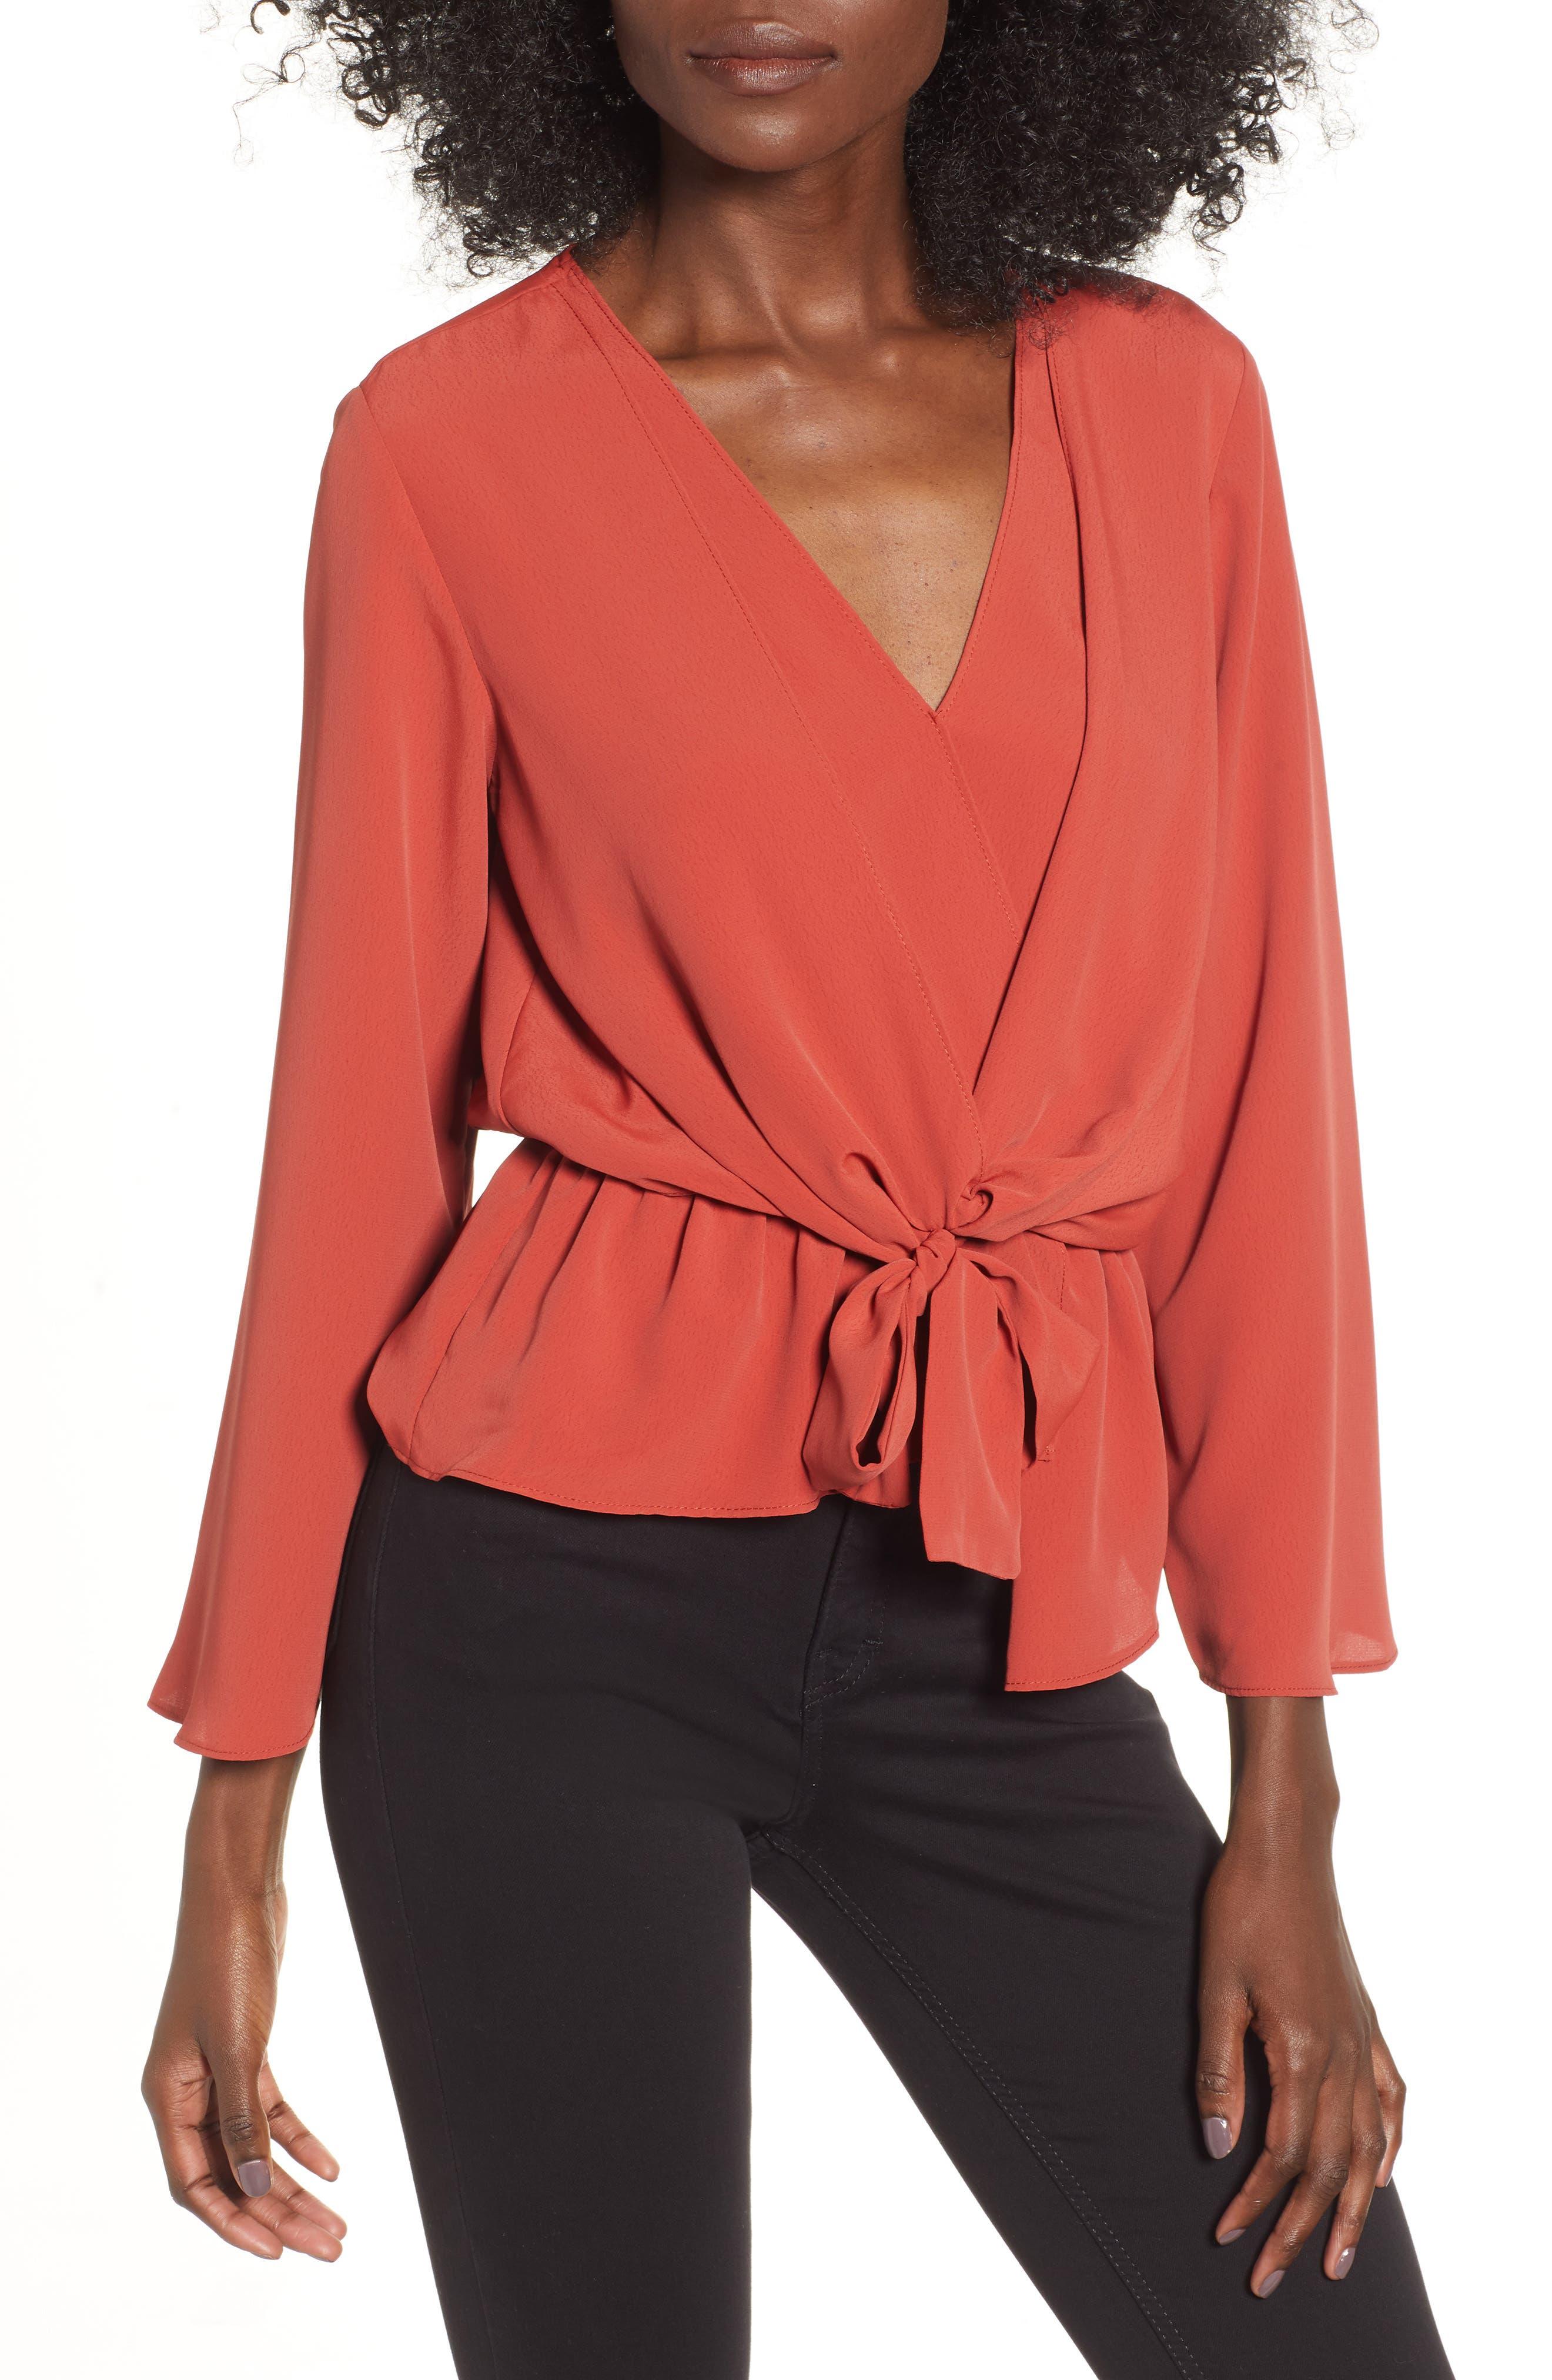 TOPSHOP, Tiffany Asymmetrical Blouse, Main thumbnail 1, color, 220